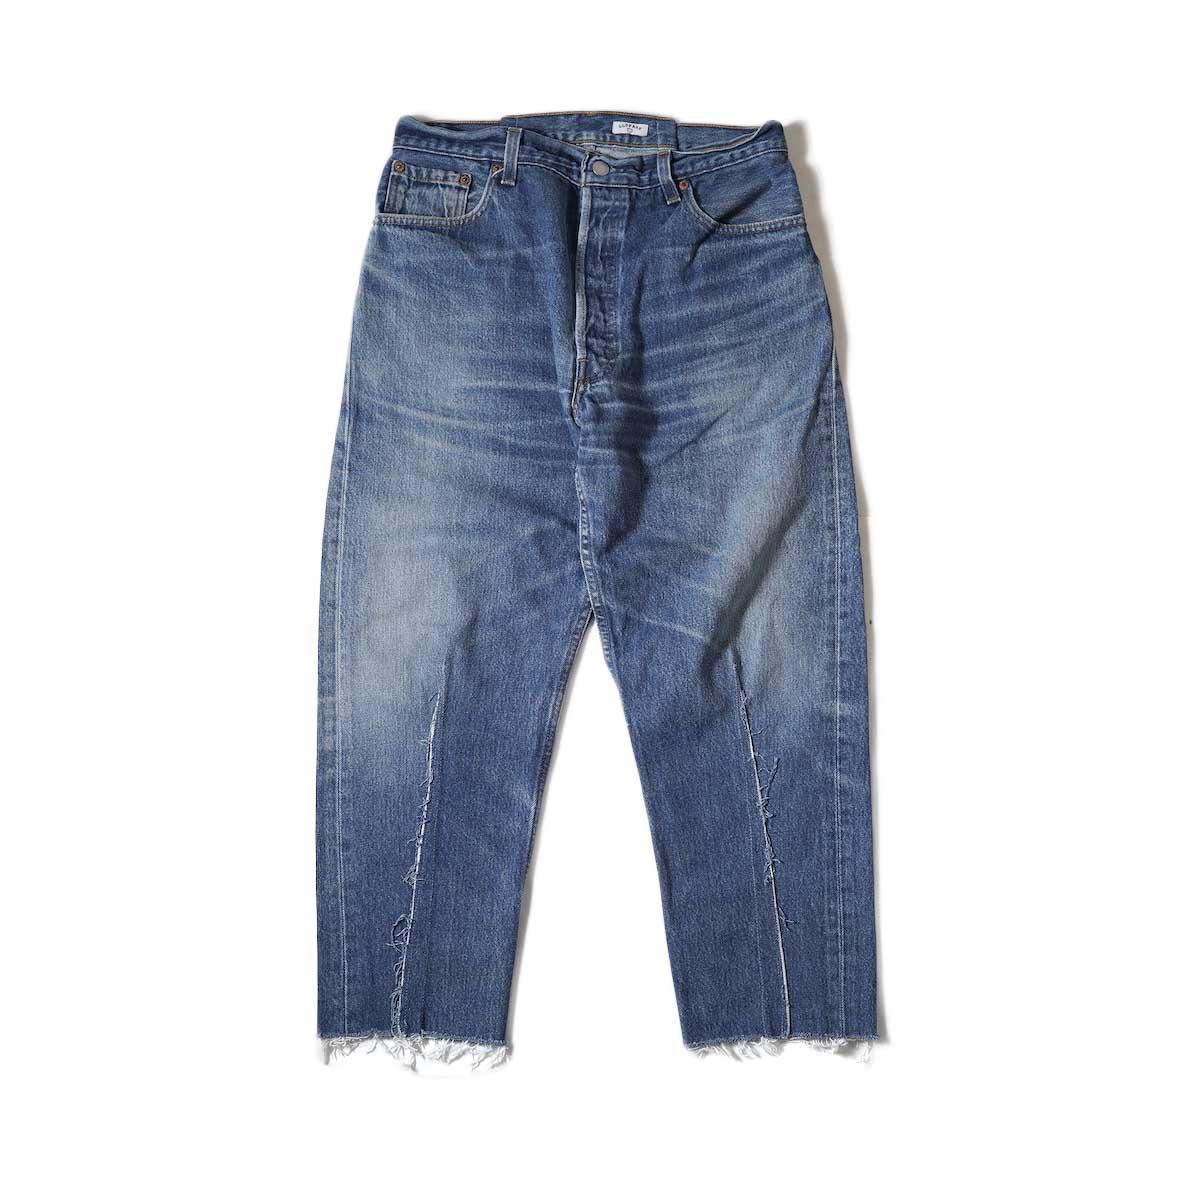 OLD PARK / Balloon Jeans (Blue) Msize-D